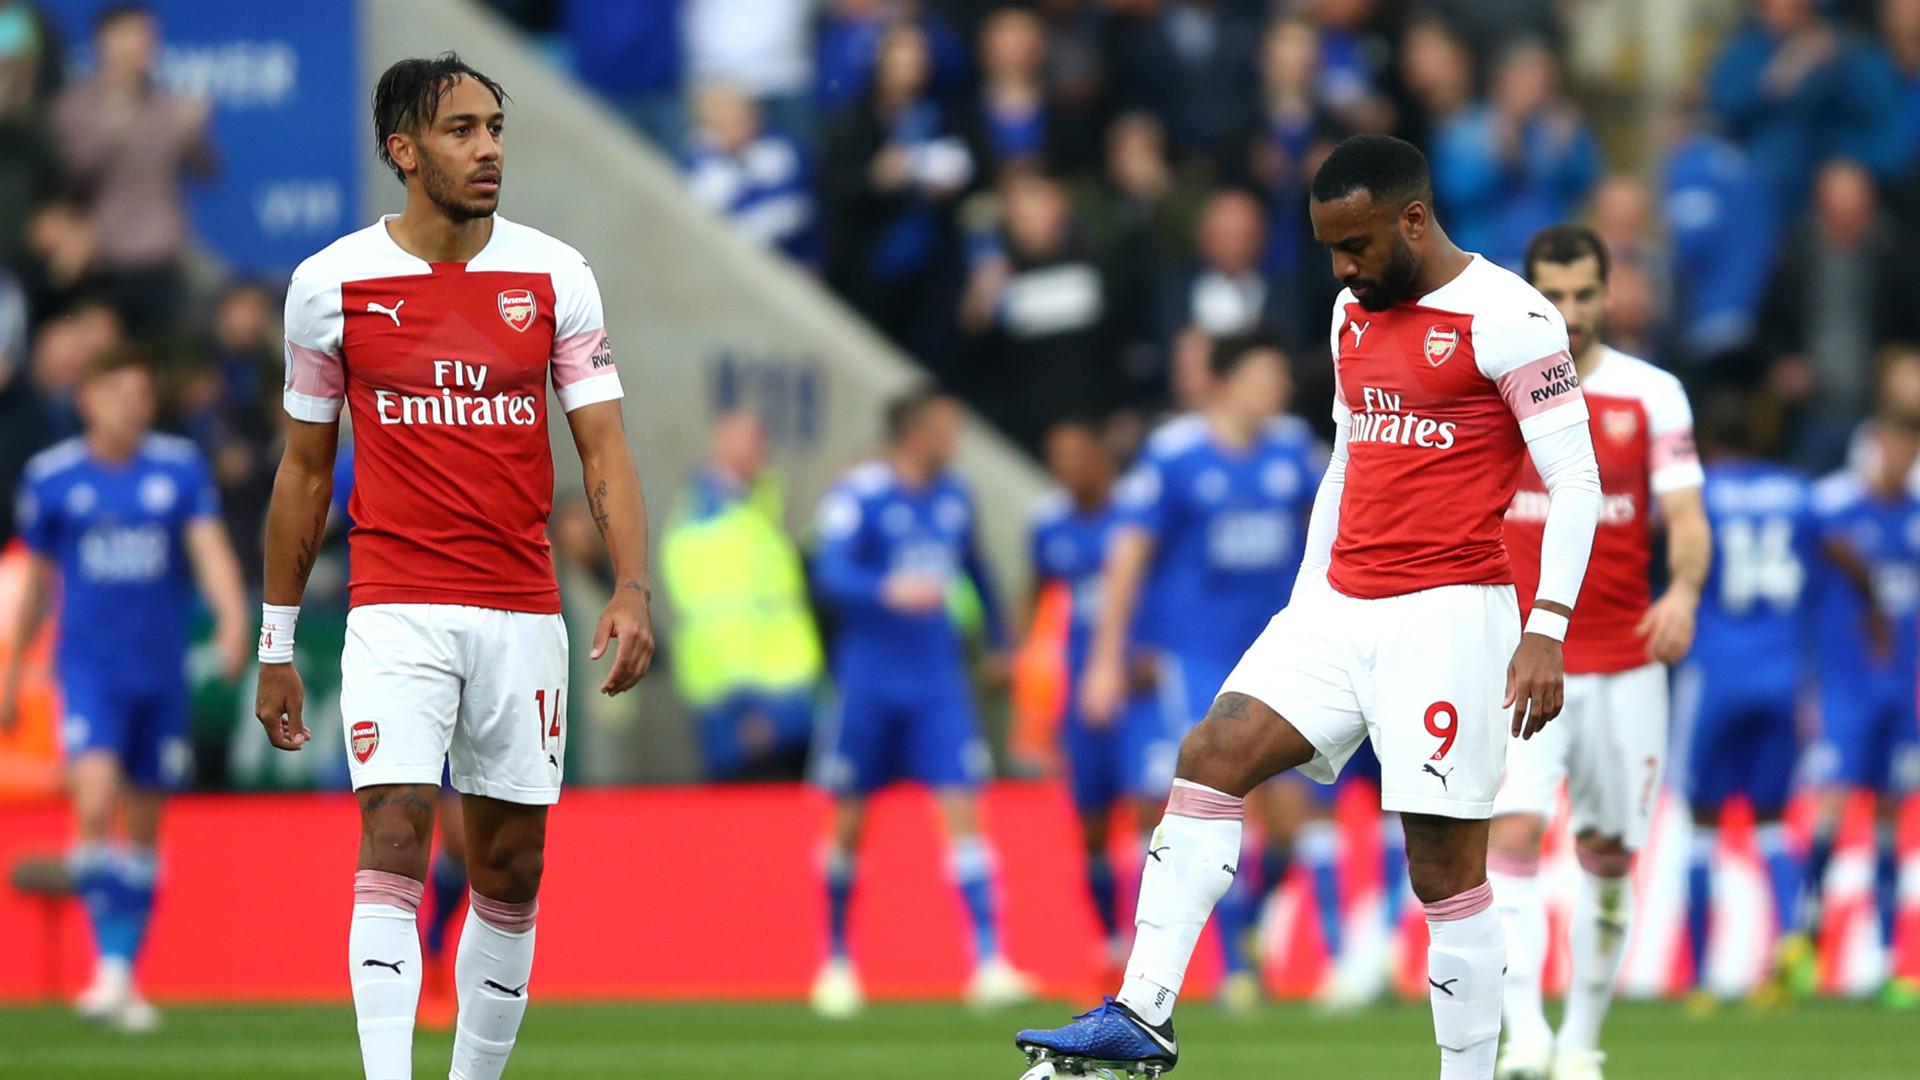 Pierre-Emerick Aubameyang Alexandre Lacazette Arsenal 2018-19